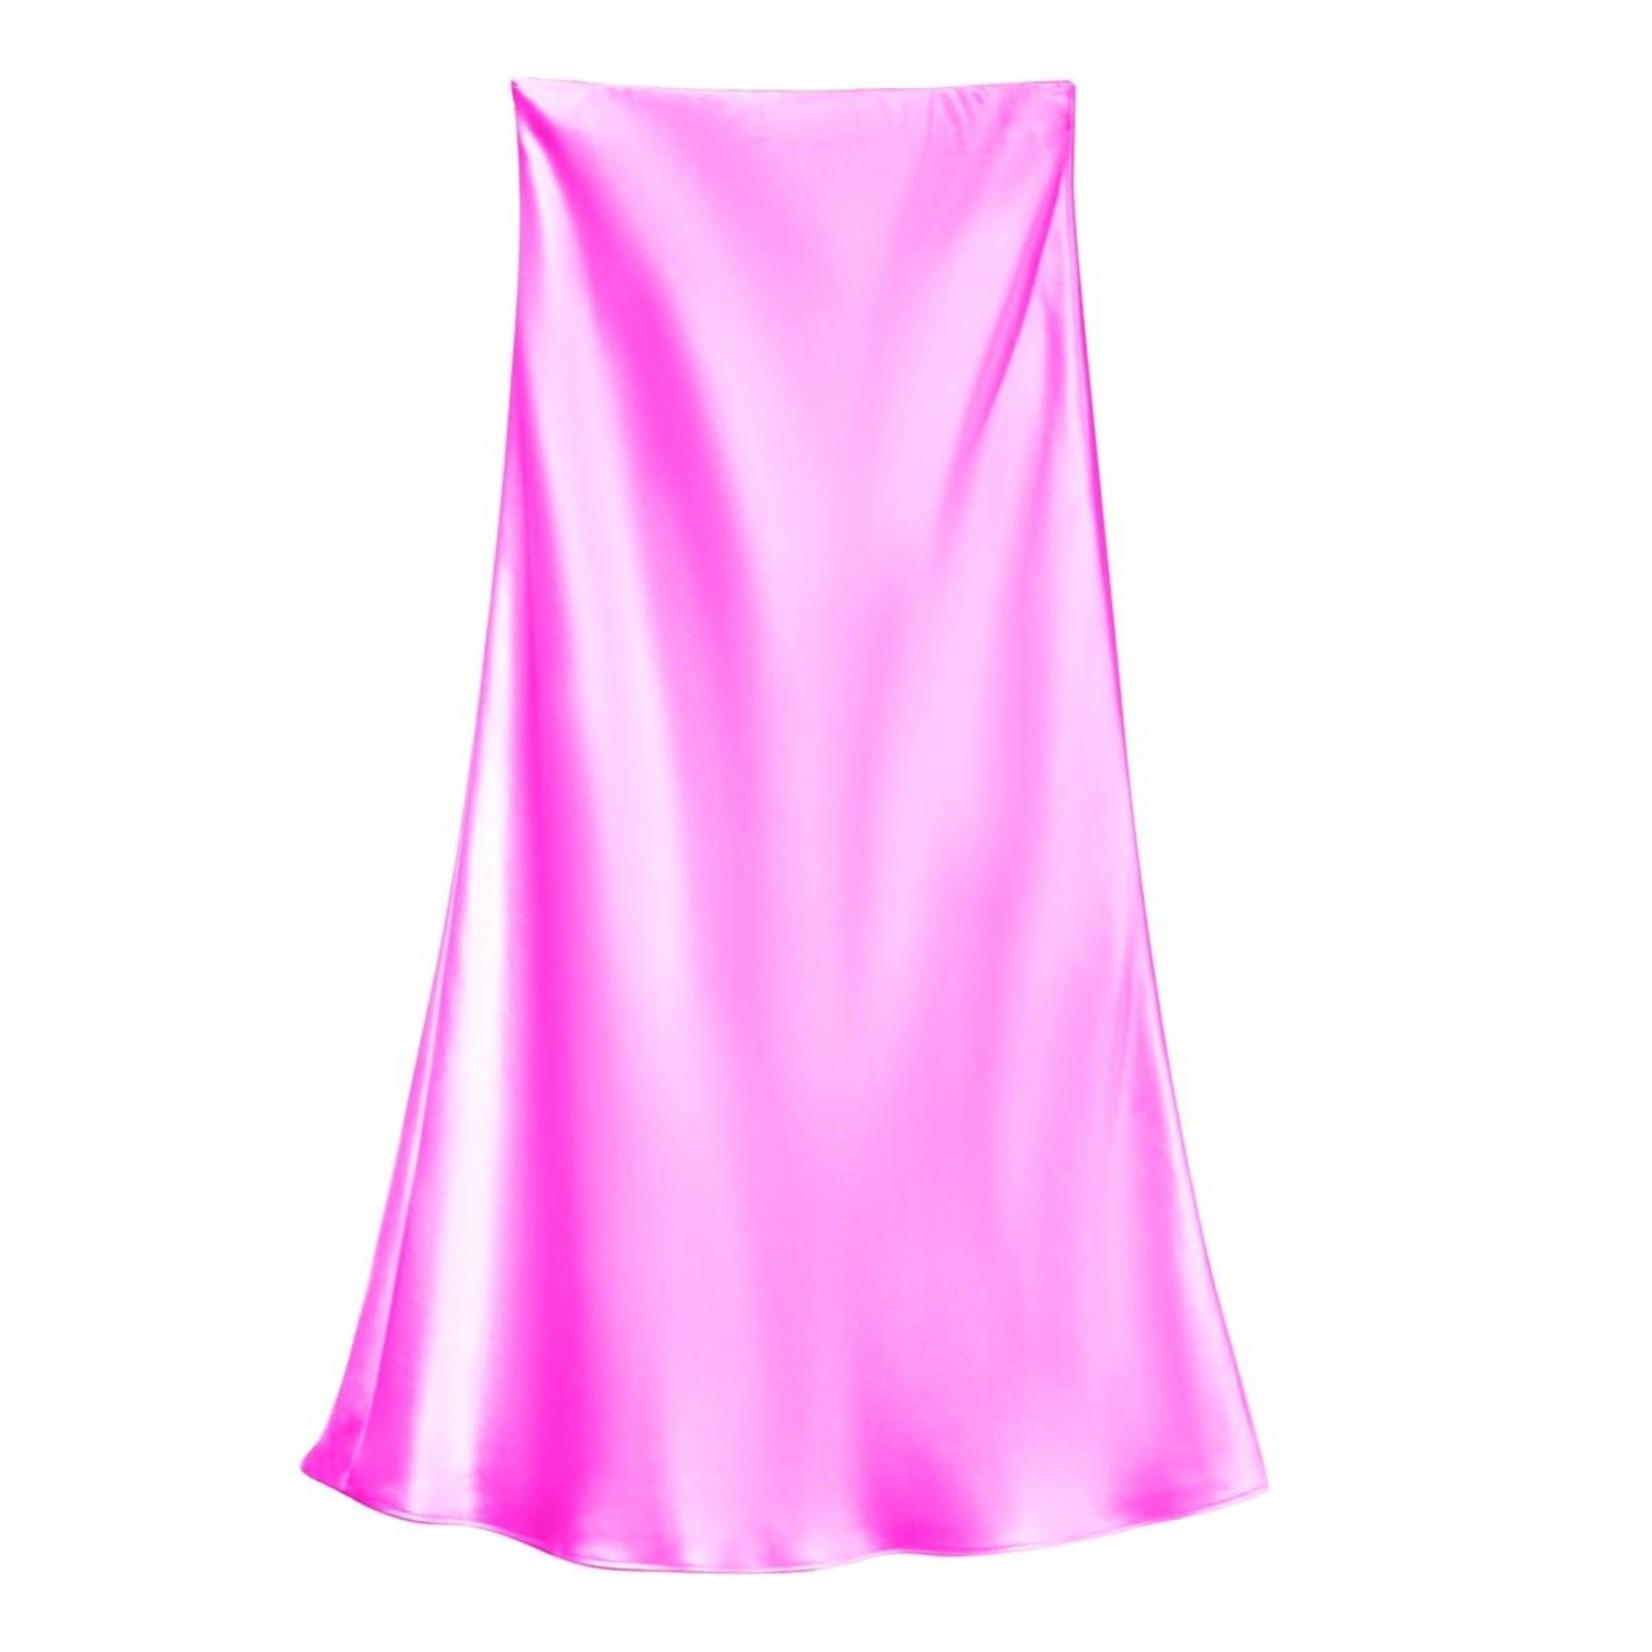 The Bar Carter Skirt